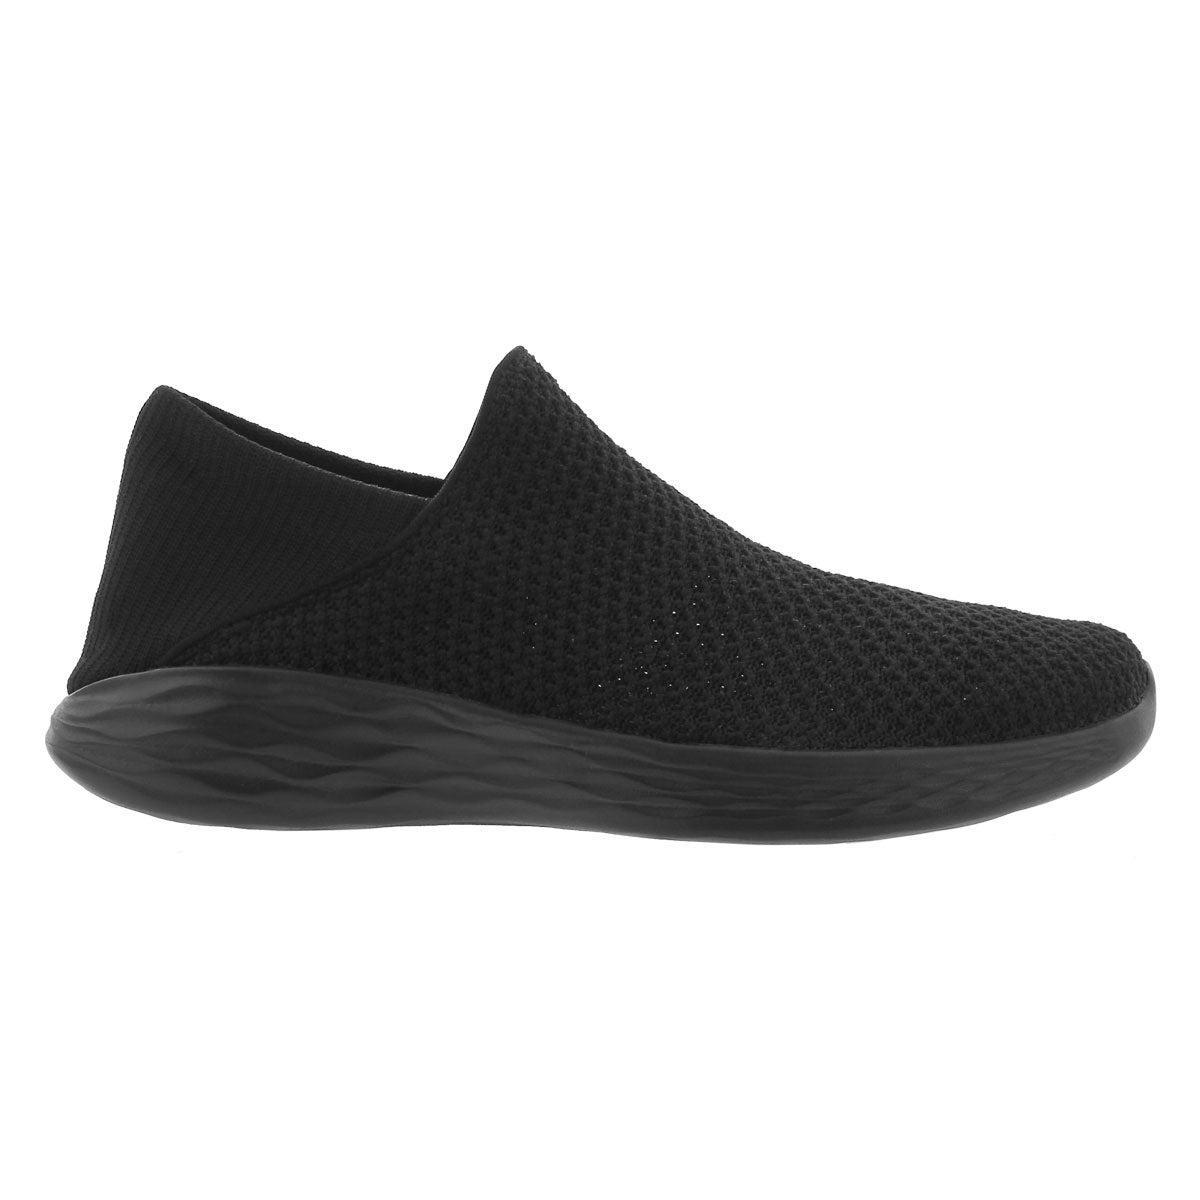 Lds You Movement blk slipon walking shoe